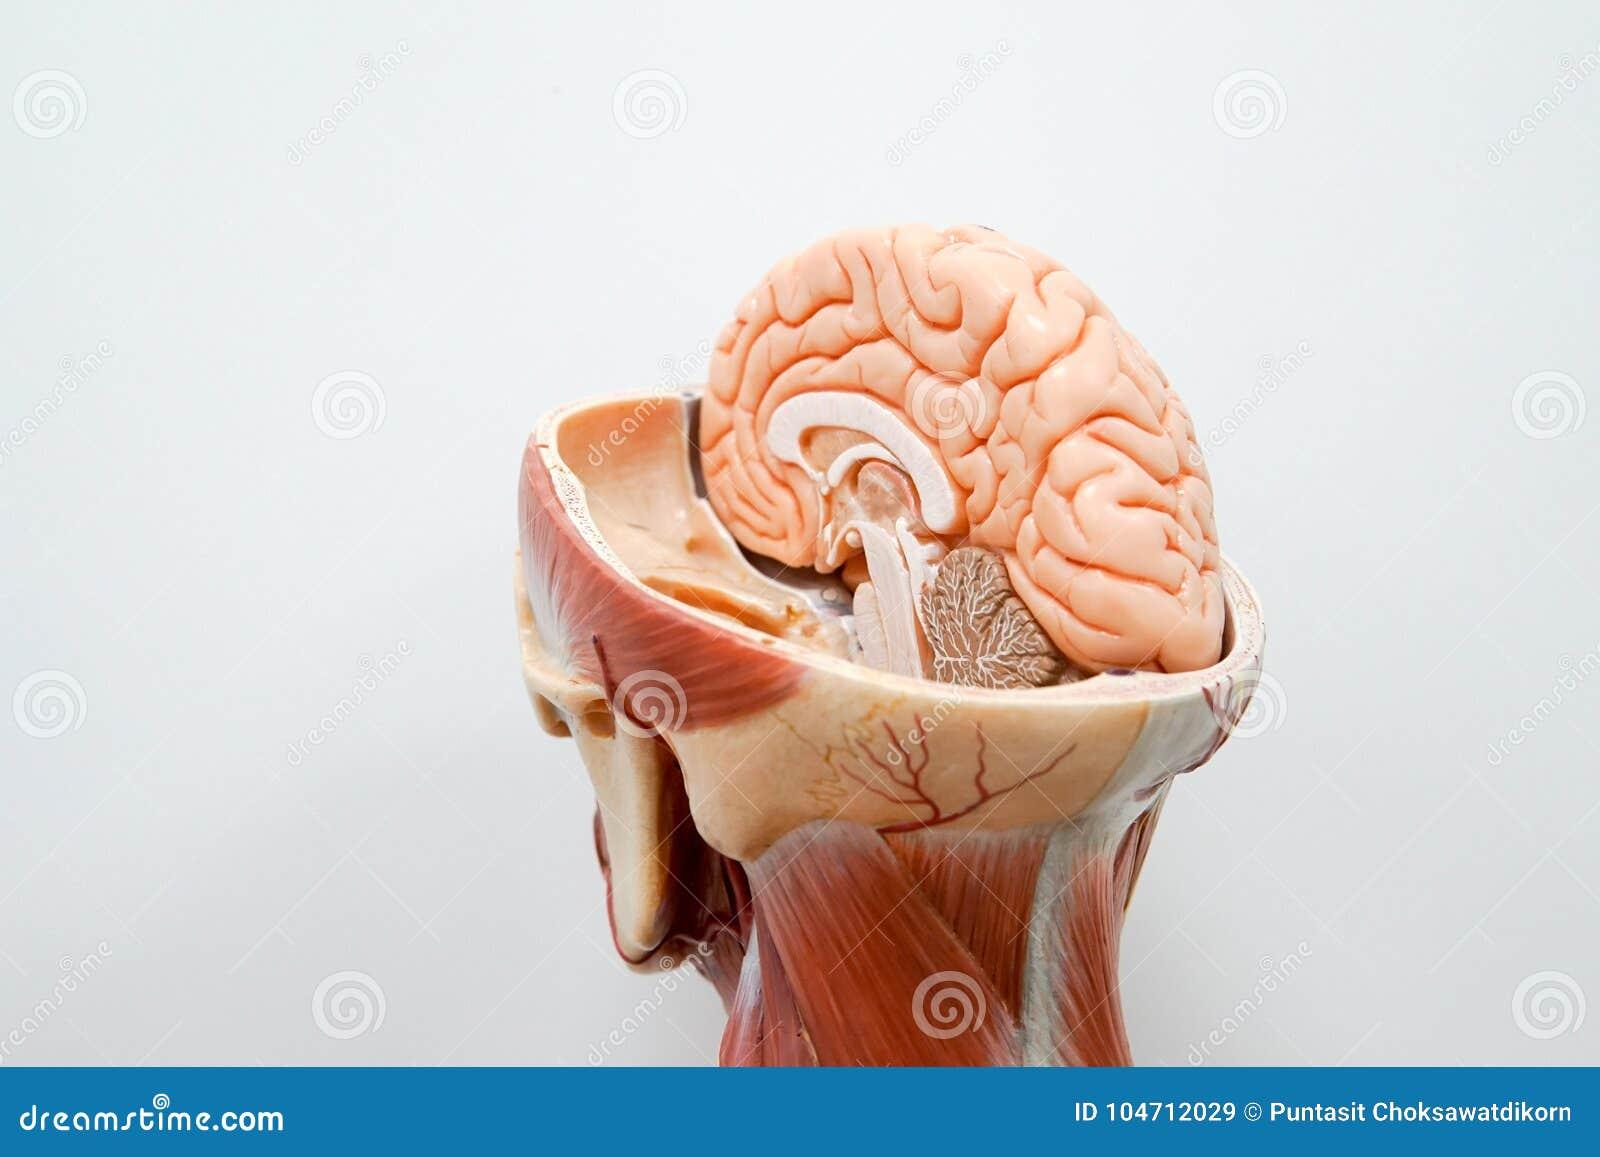 Human Brain Anatomy Model Stock Image Image Of Head 104712029